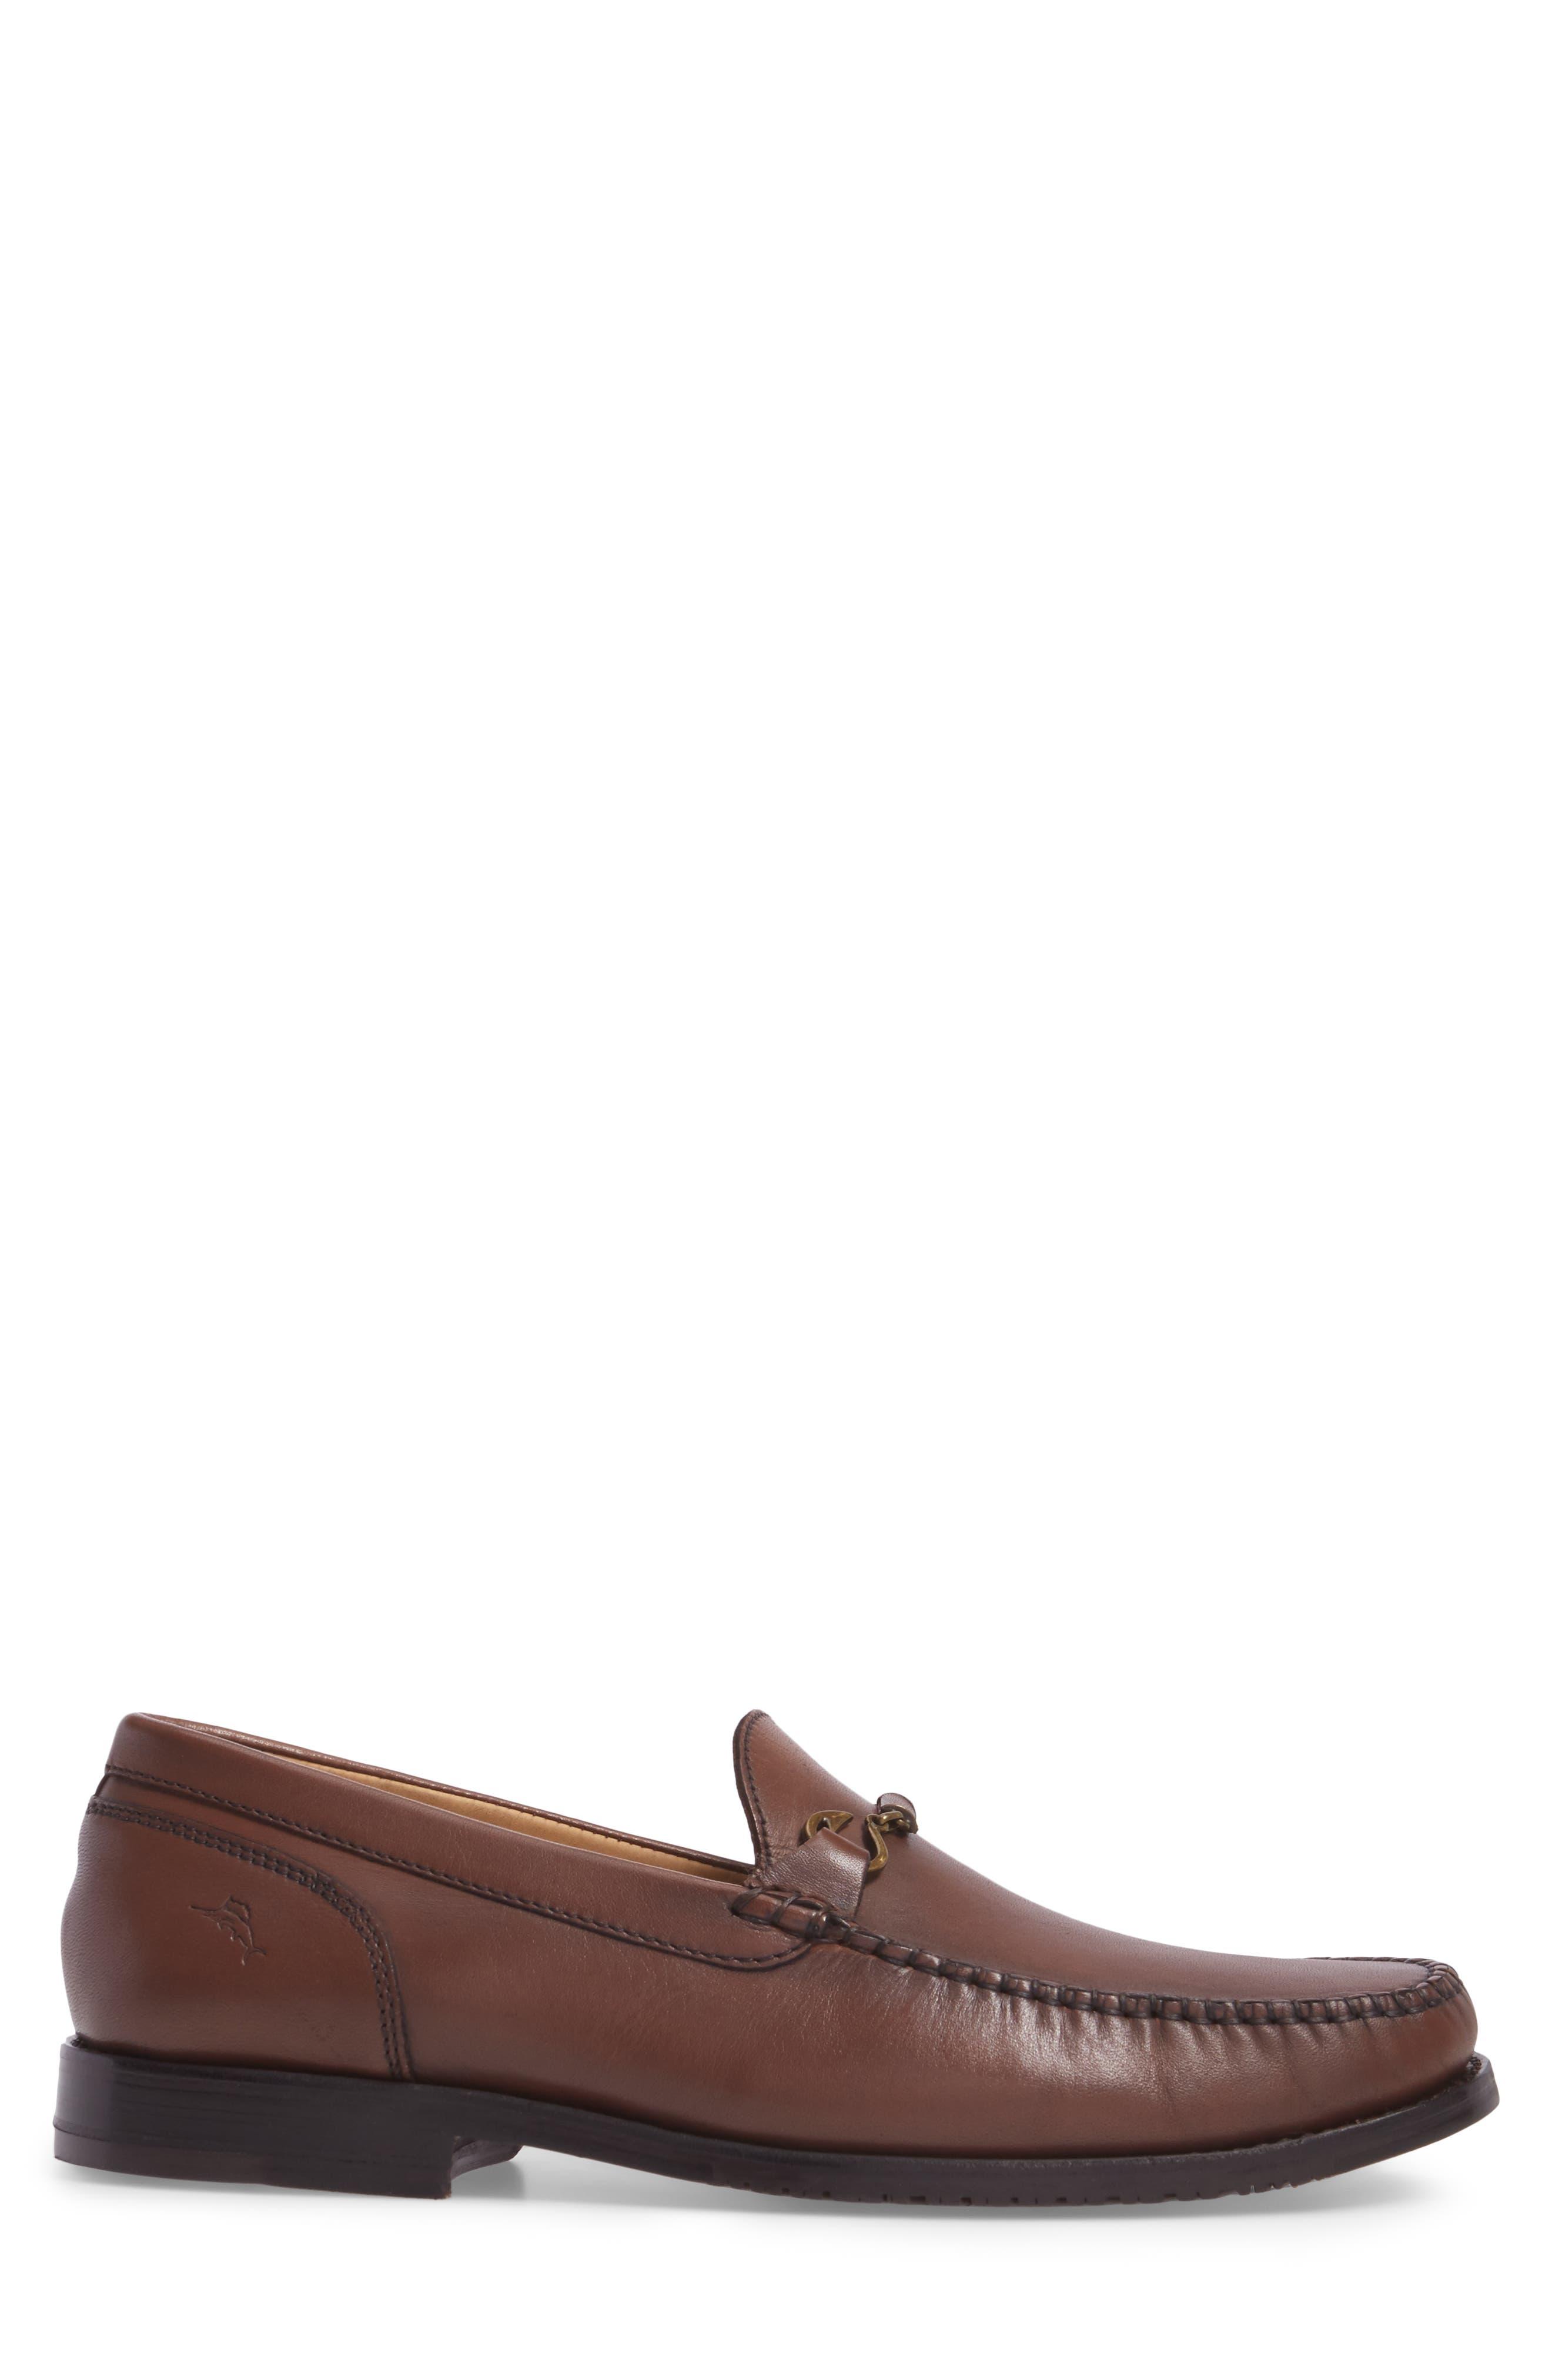 Maya Bay Bit Loafer,                             Alternate thumbnail 3, color,                             Brown Leather